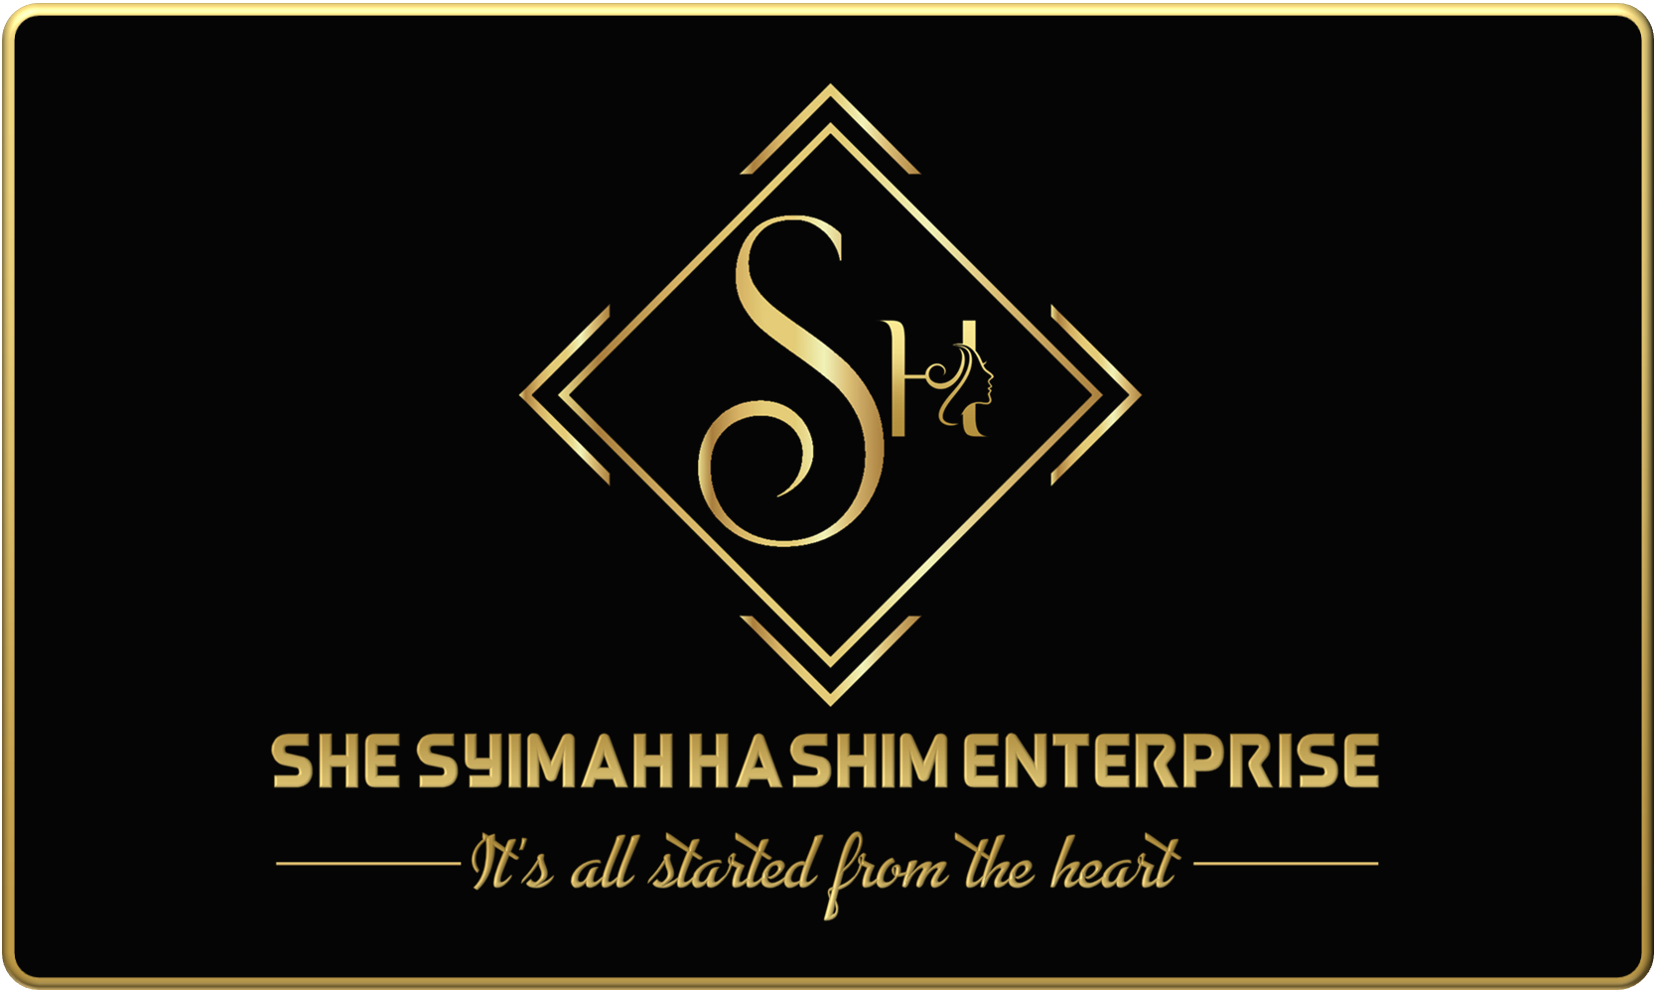 She Syimah Hashim Enterprise